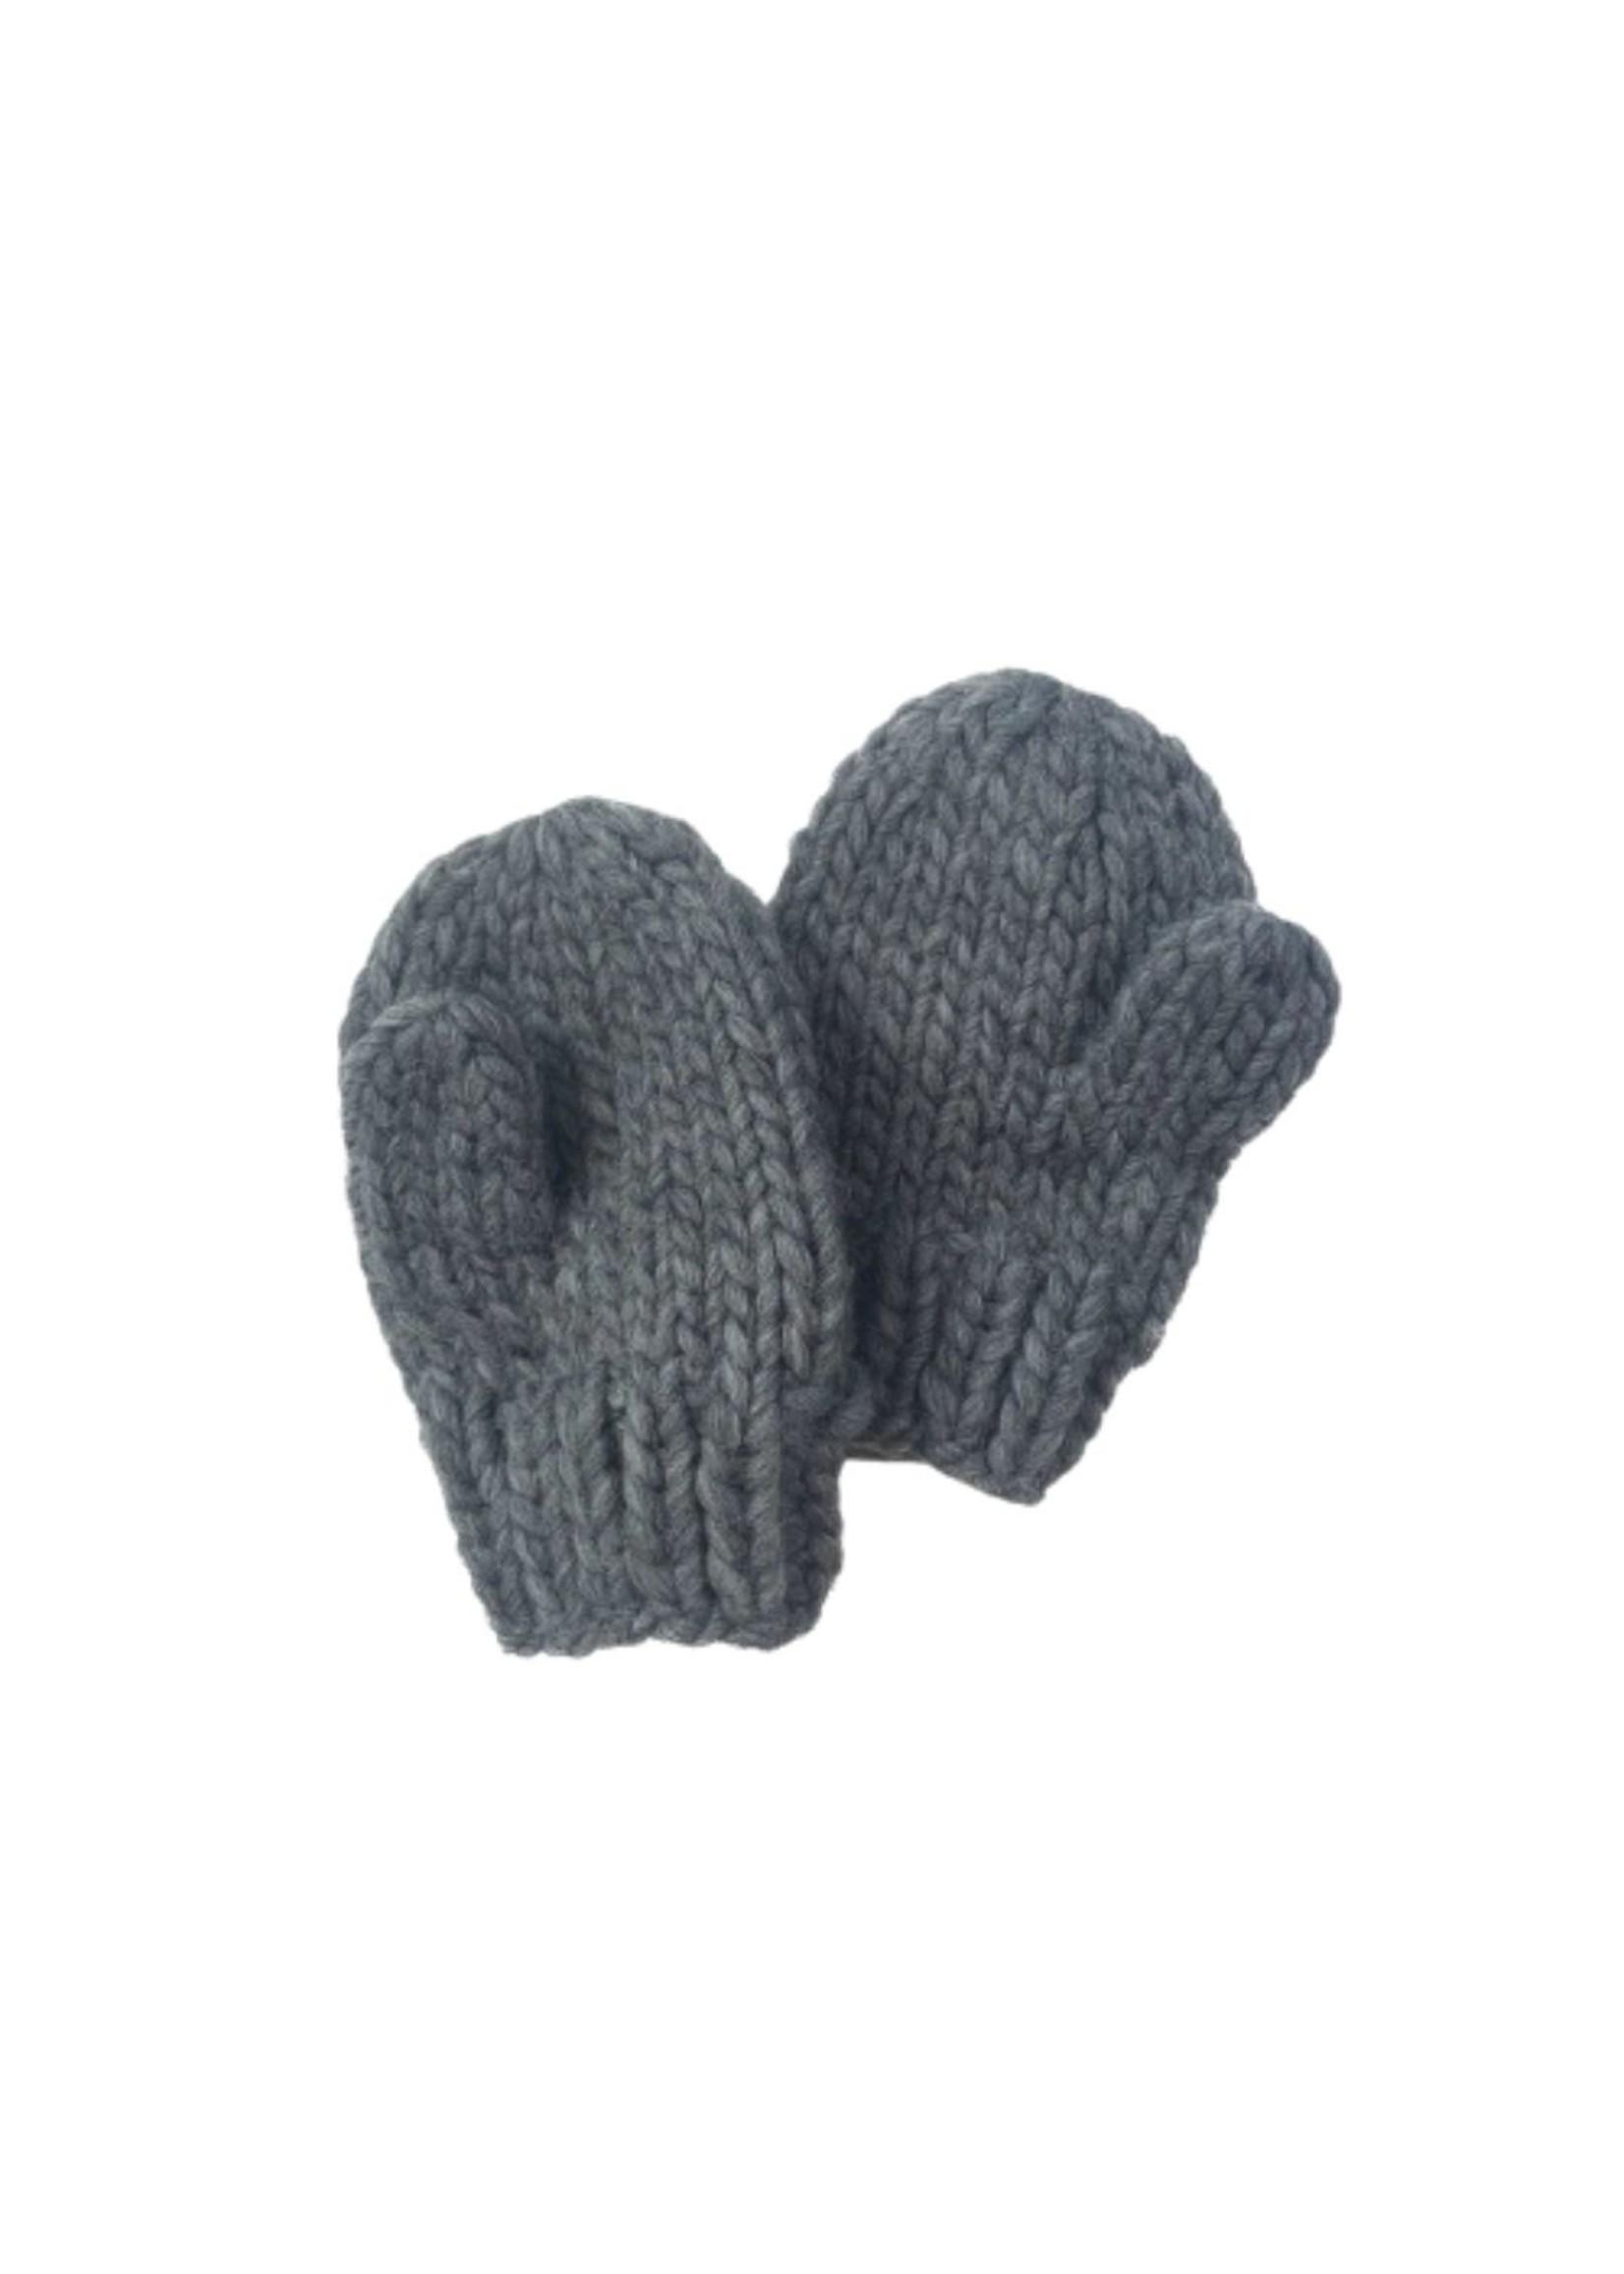 Blue Zinc Knit Mittens